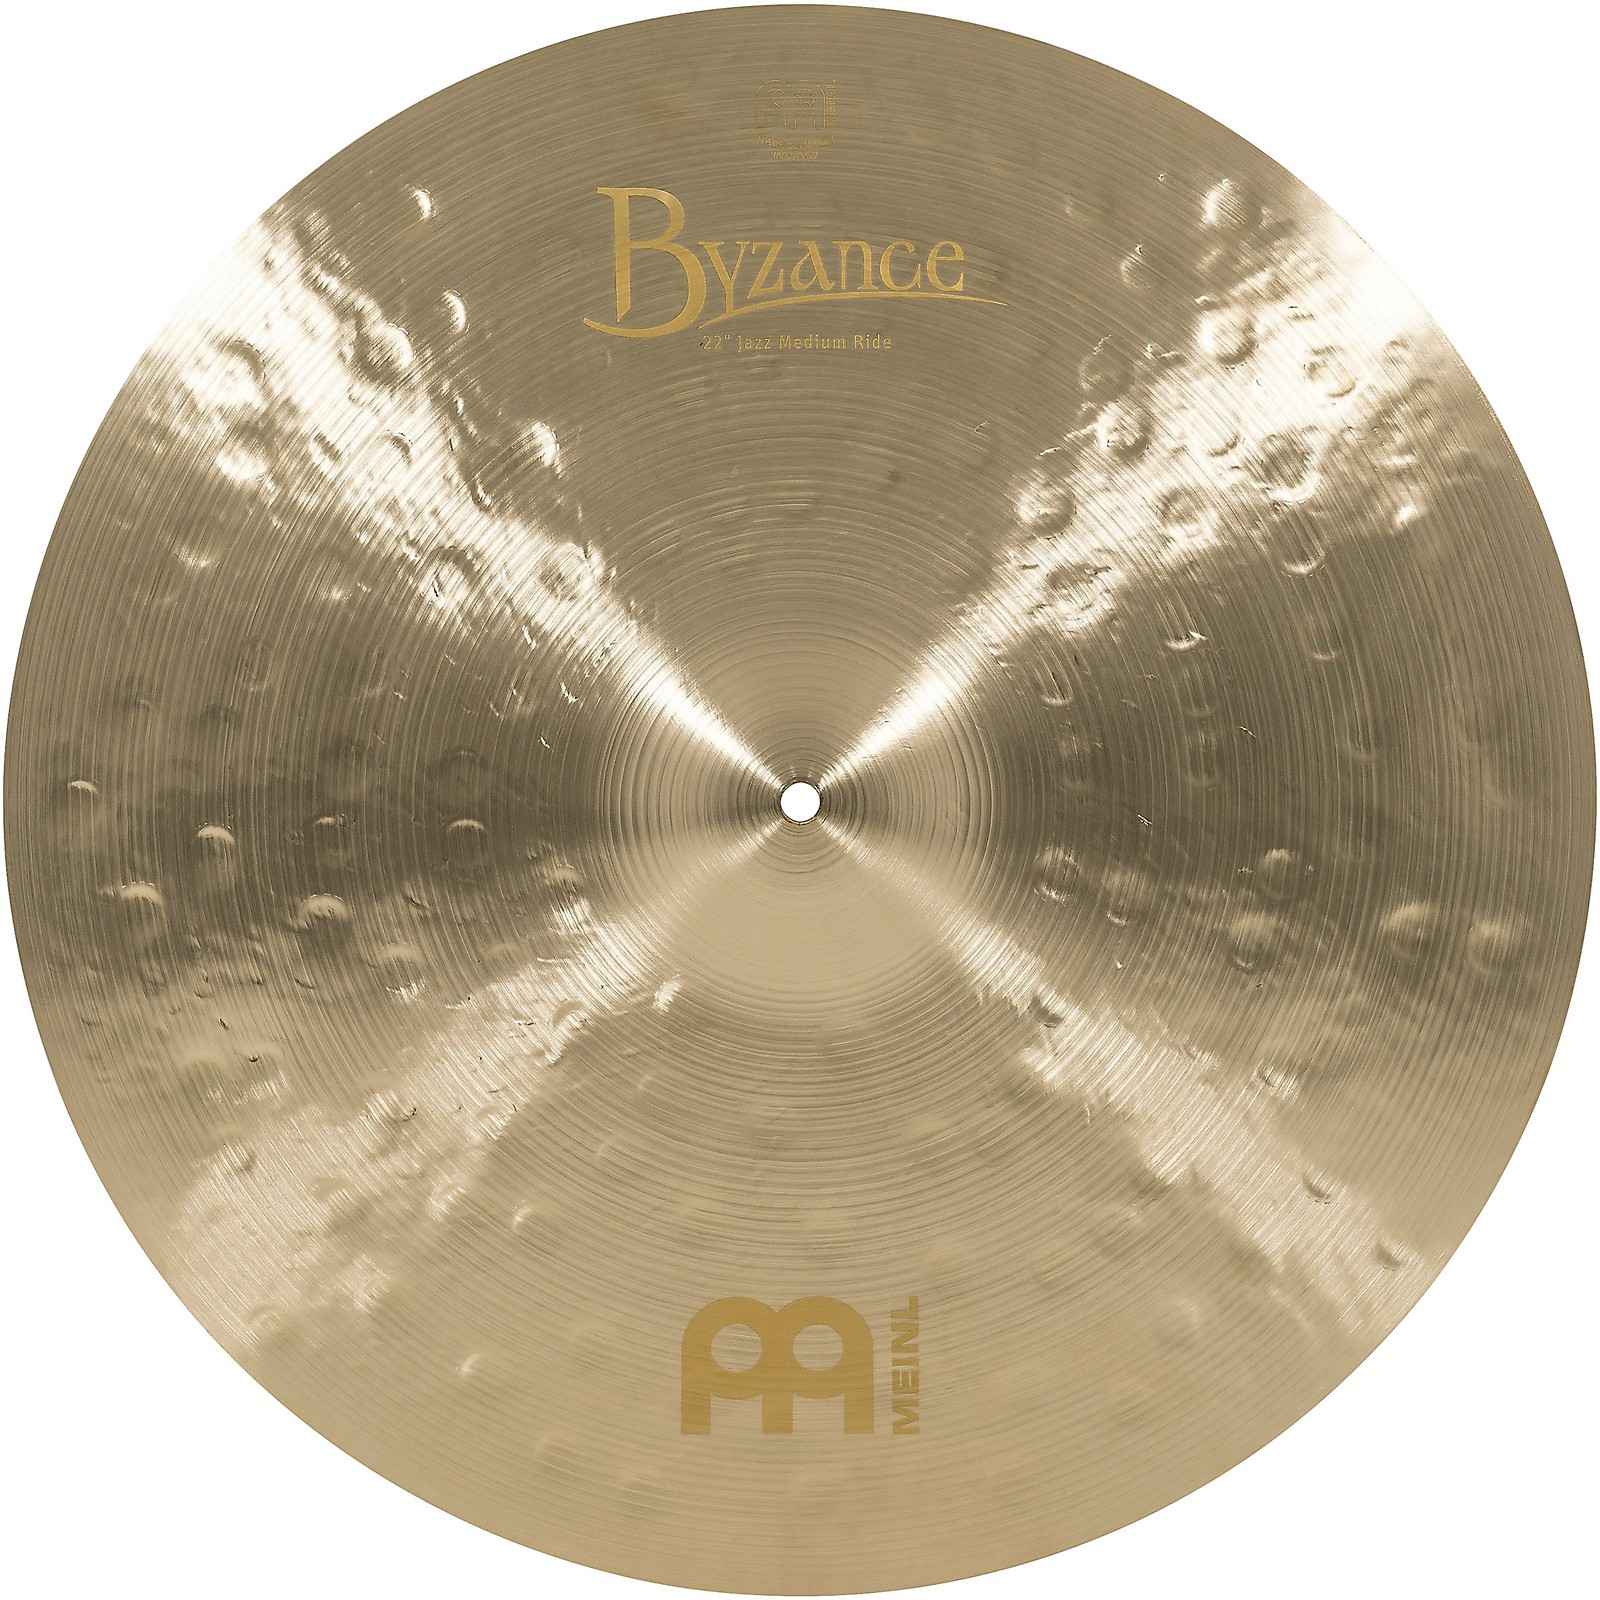 Meinl Byzance Jazz Series Medium Ride Cymbal